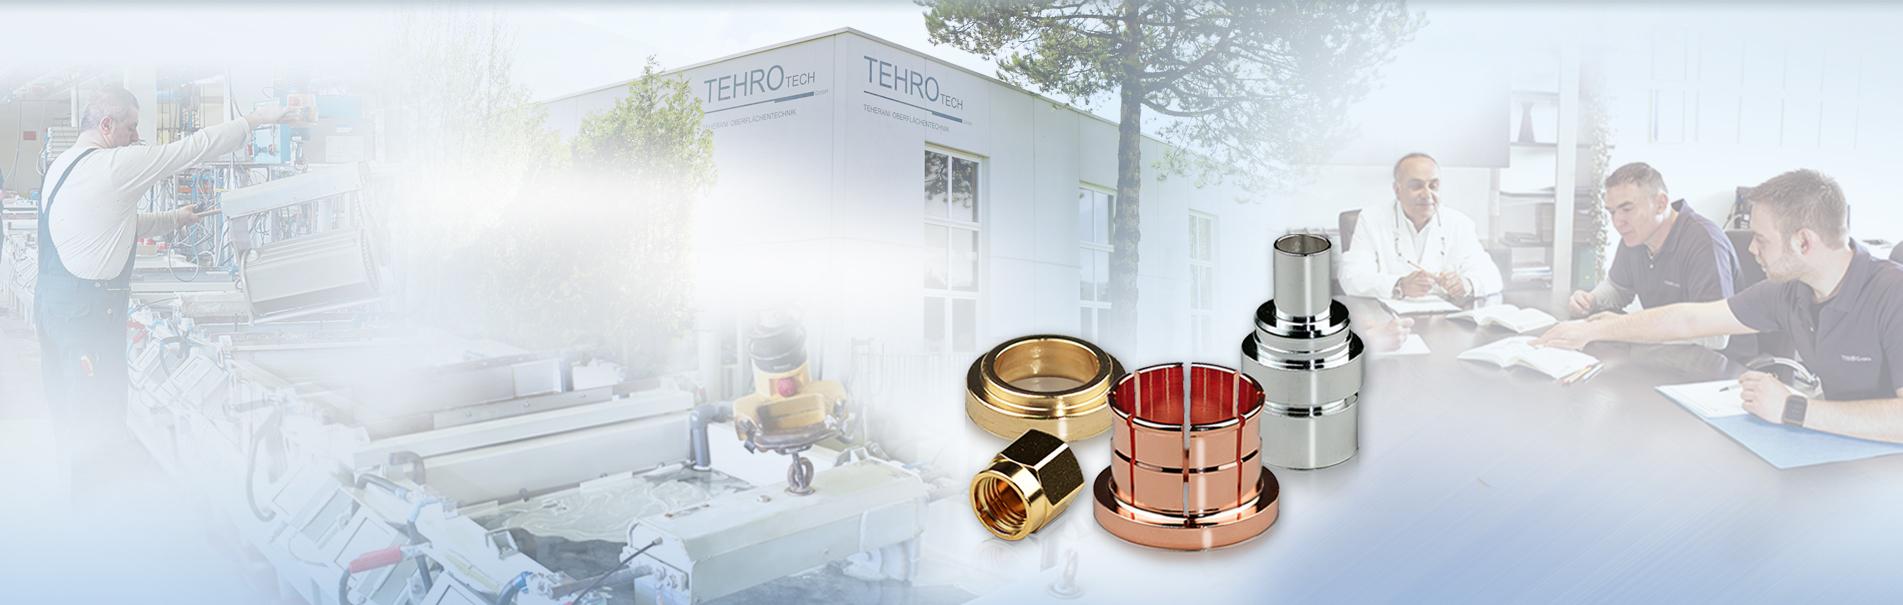 Tehrotech GmbH – Teherani Oberflächentechnik